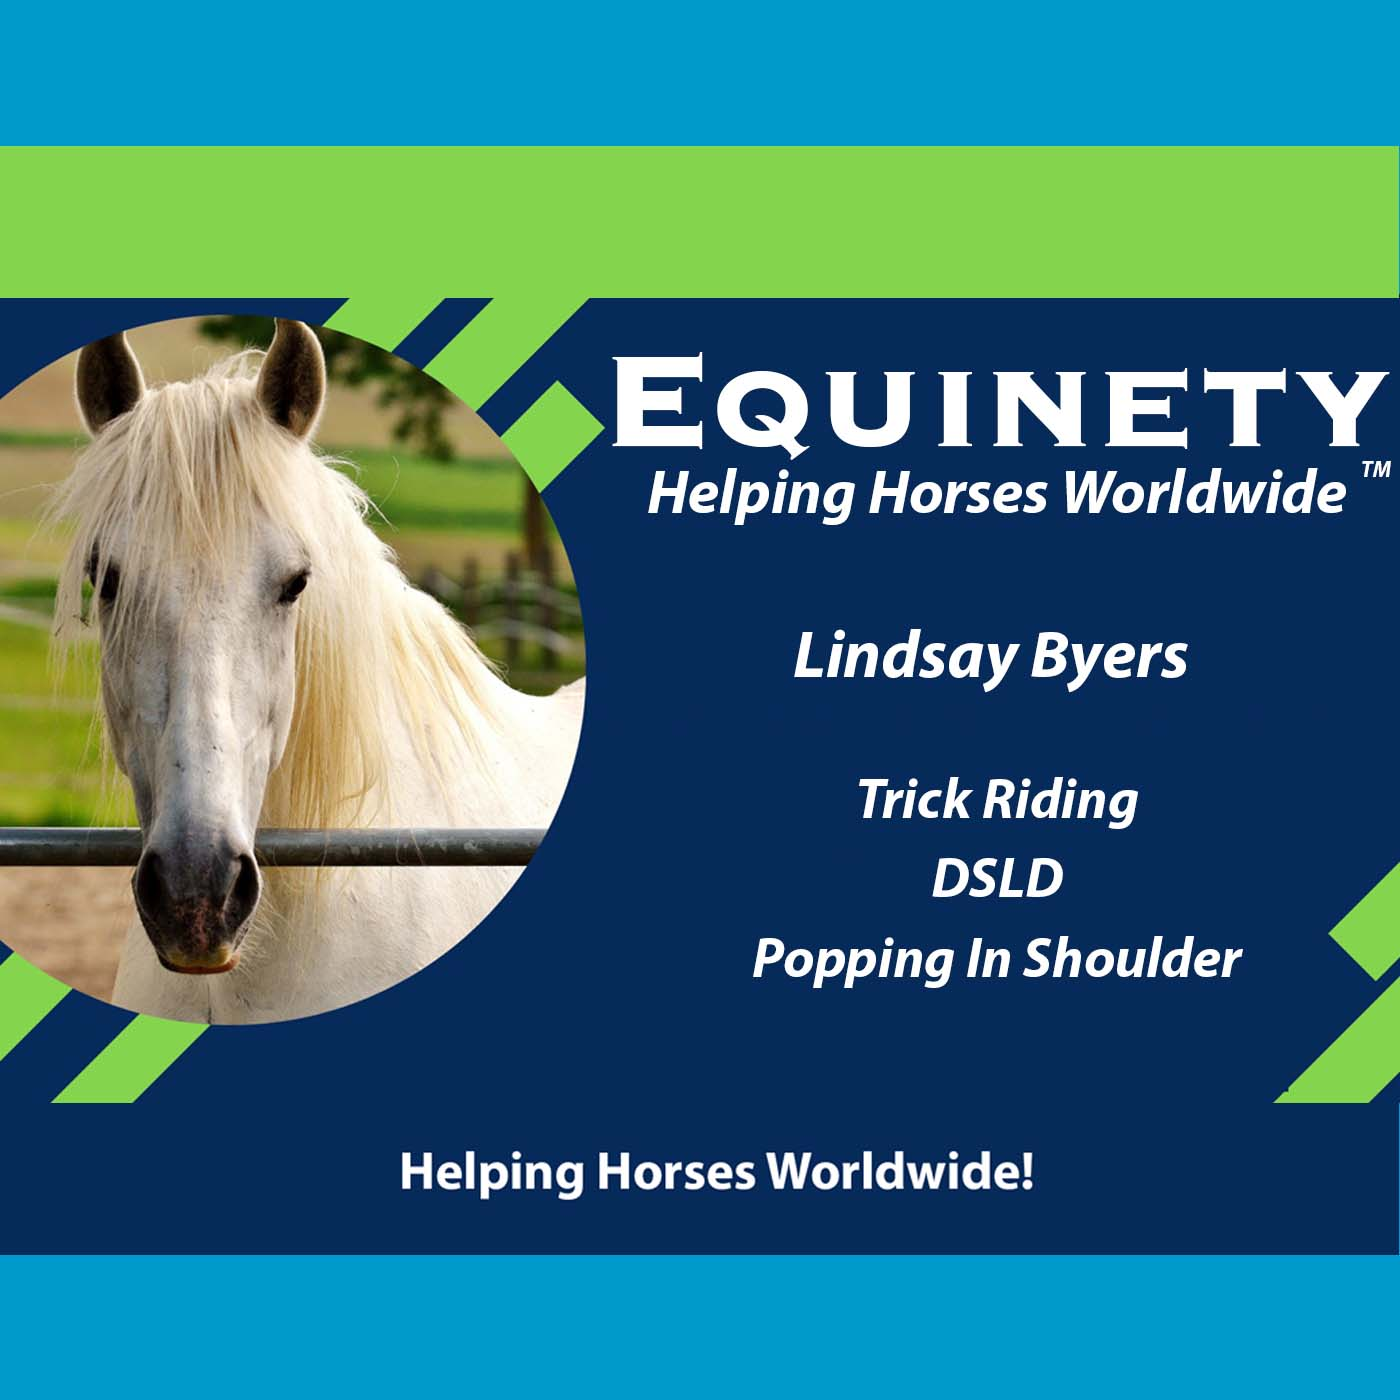 Lindsay Byers TX – Trick Riding – DSLD – Popping in Shoulder